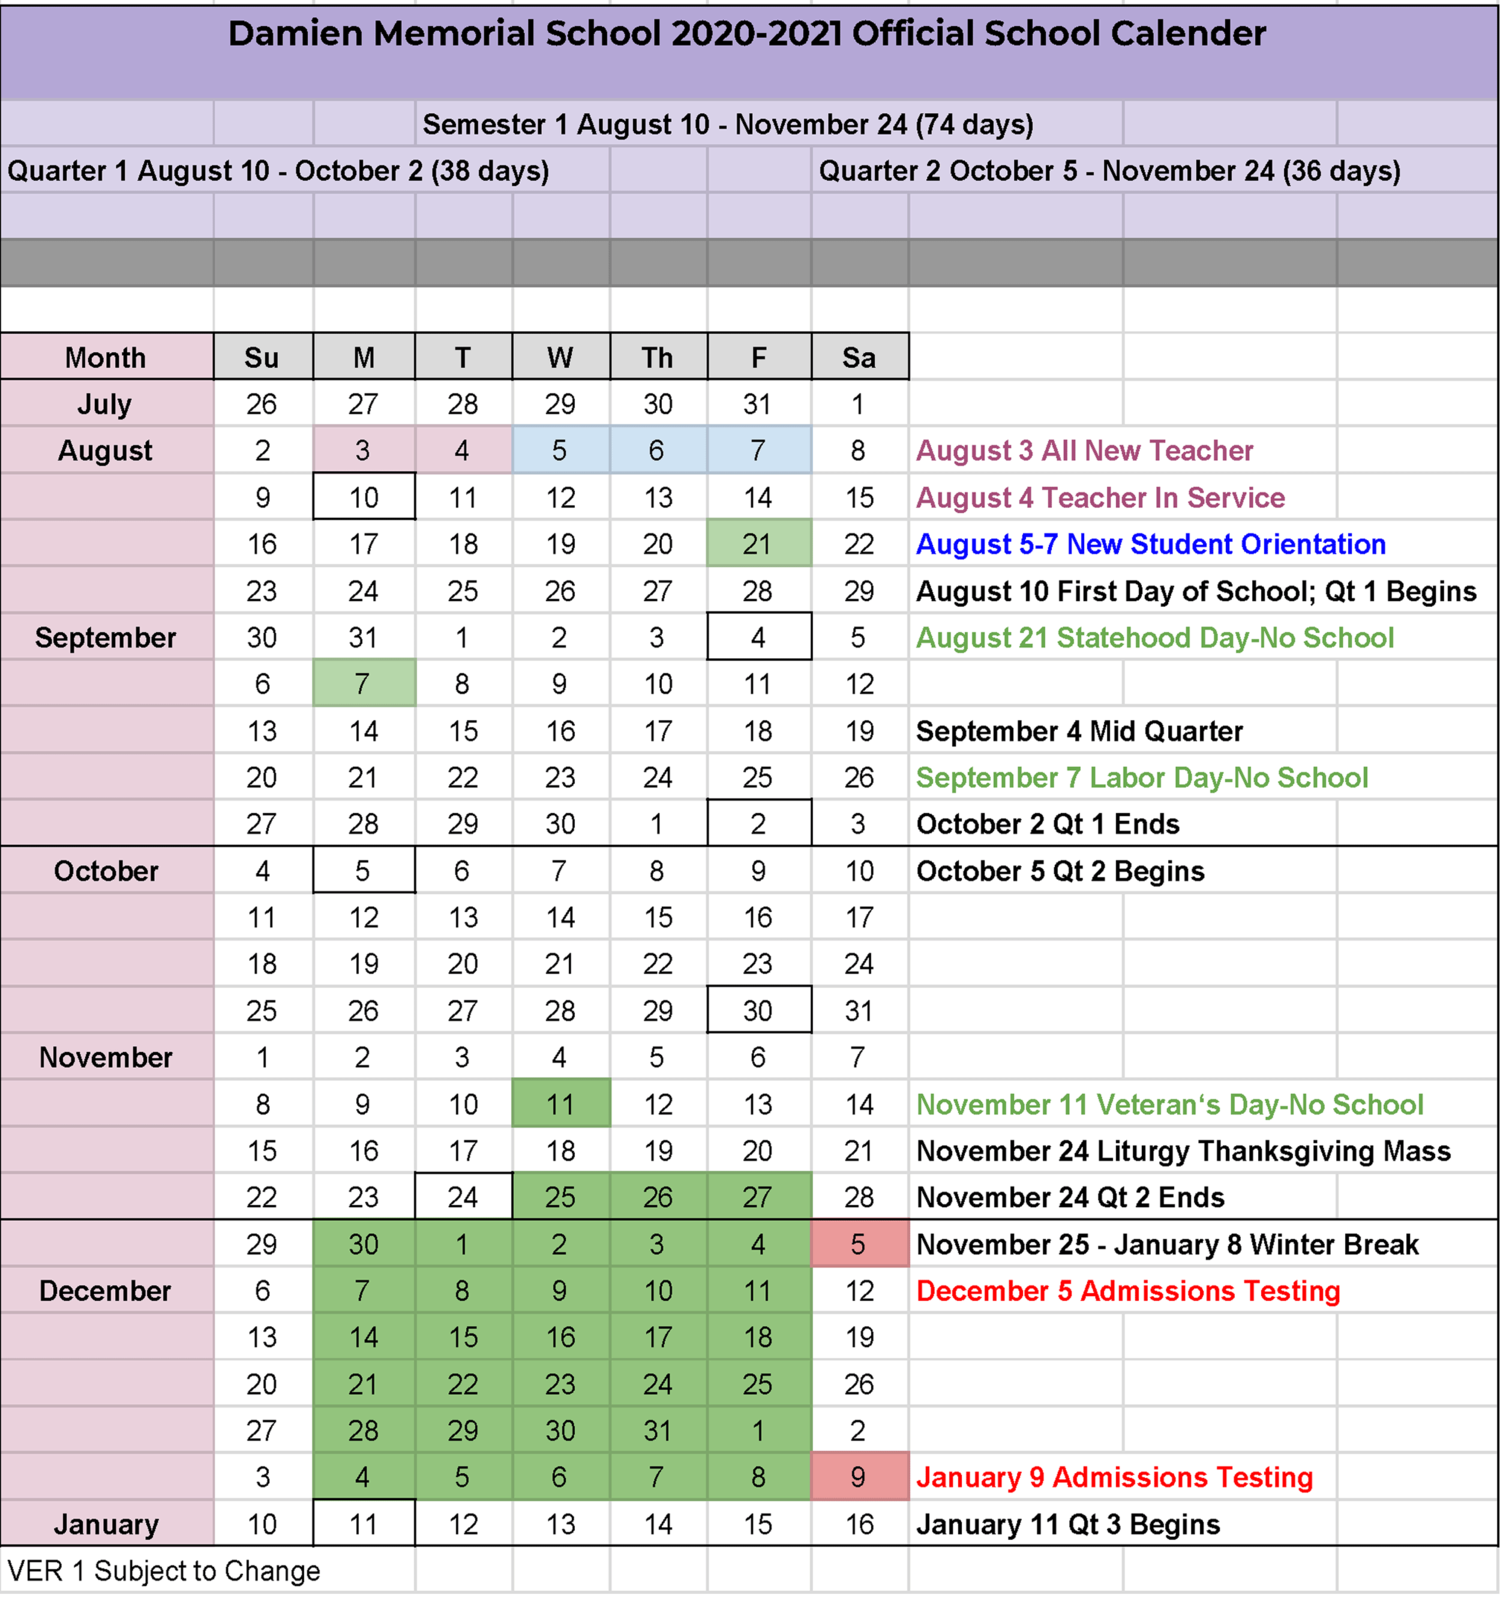 Rice Academic Calendar Spring 2022.2020 2021 Semester Calendar Damien Memorial School